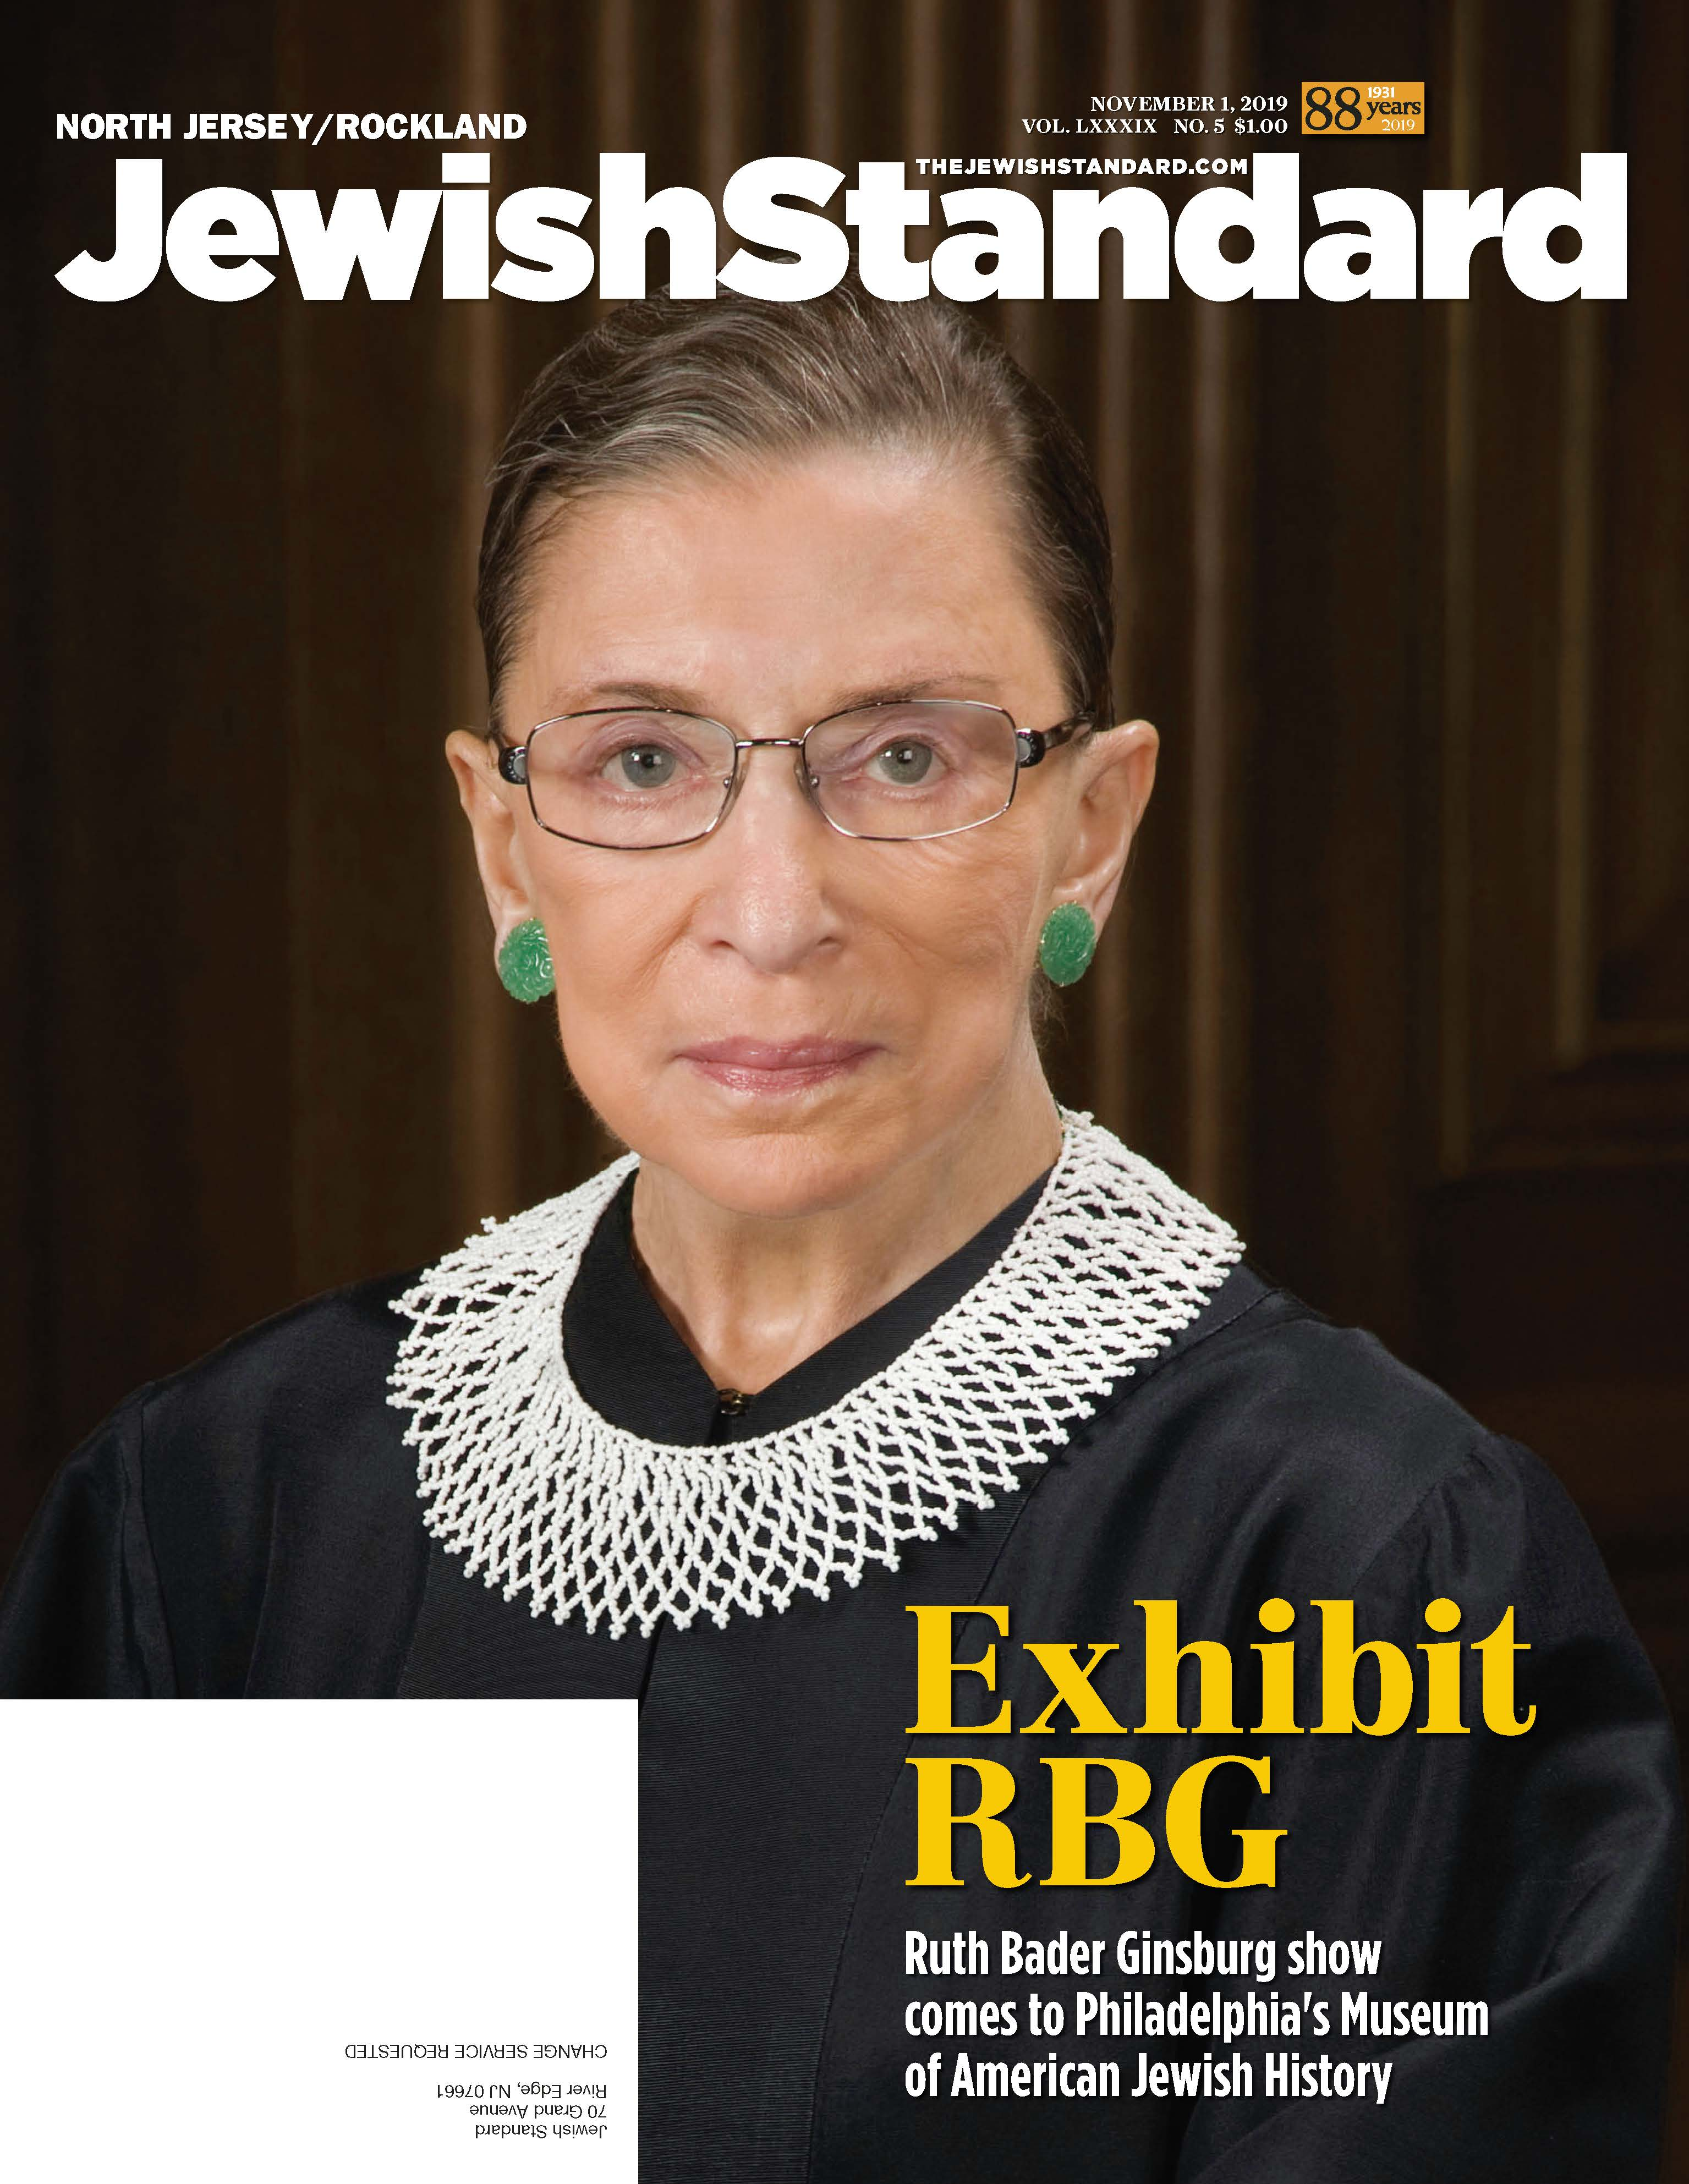 Jewish Standard, November 1, 2019